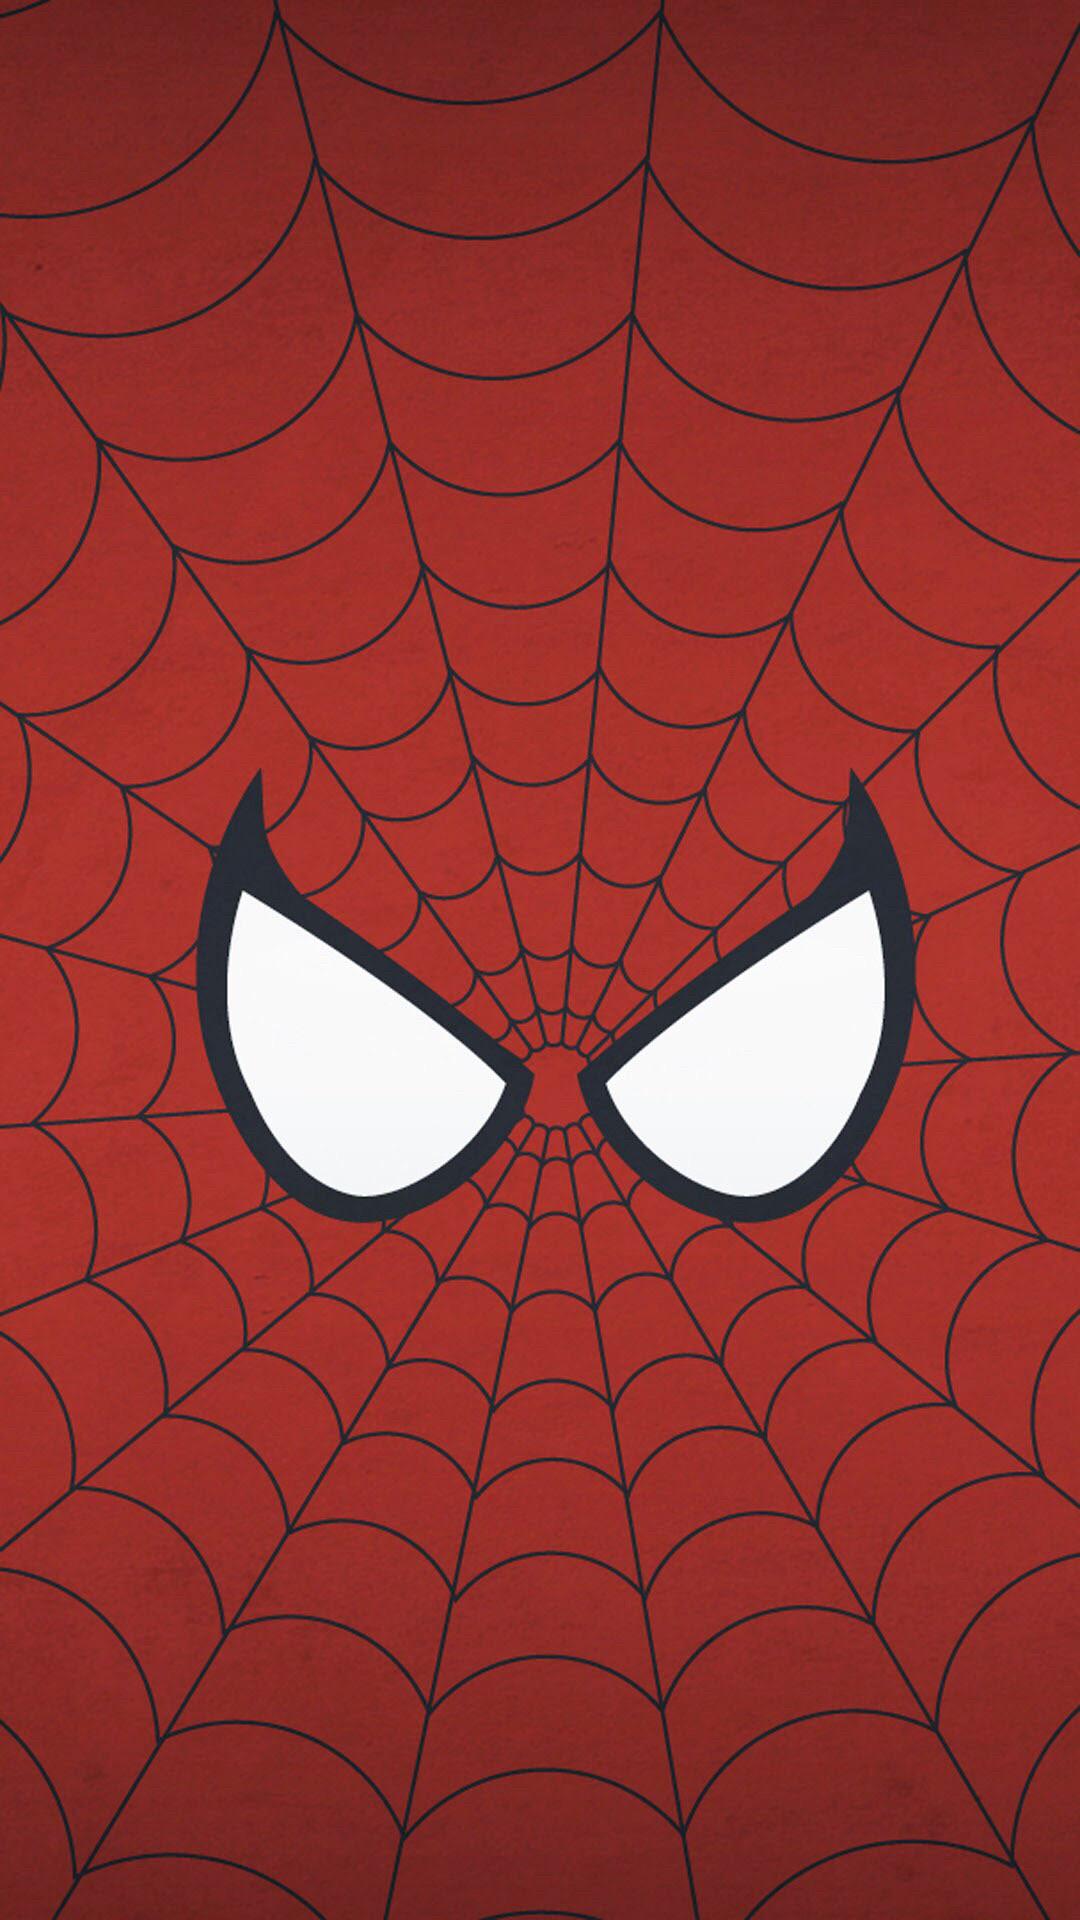 Best 25+ Spiderman wallpapers ideas on Pinterest | El hombre araña 2017,  Spiderman and Trajes de spiderman